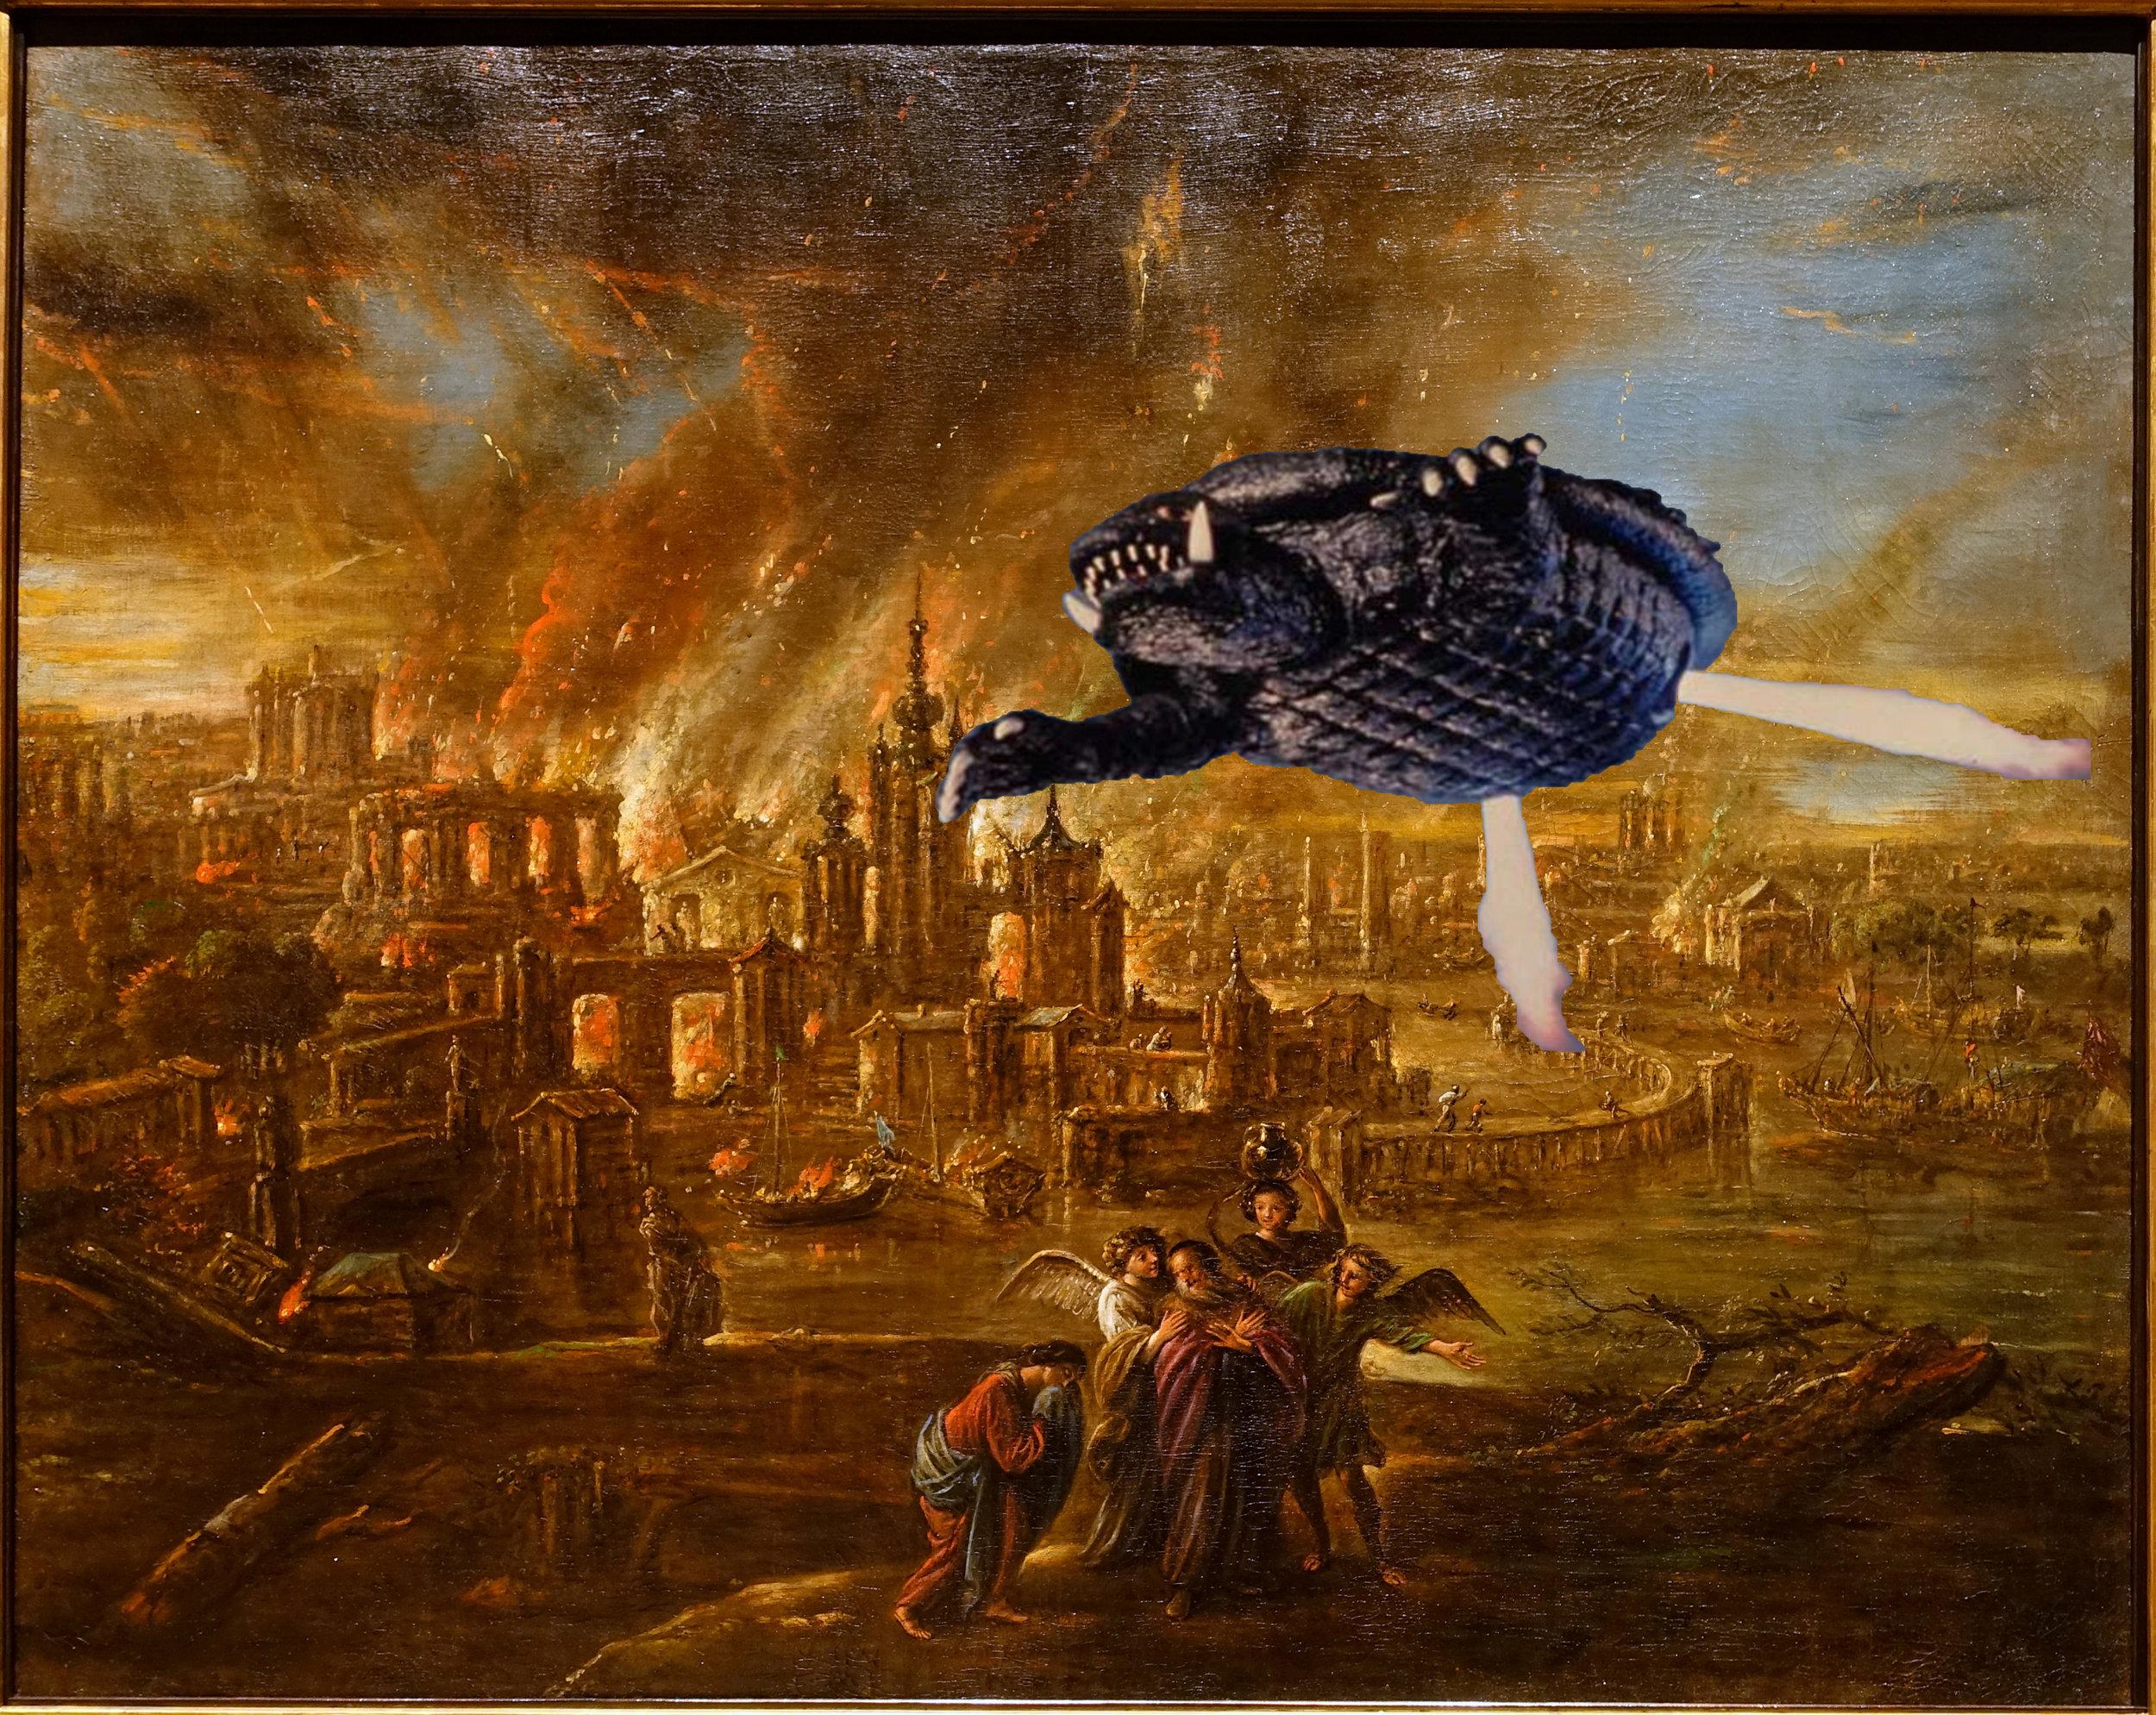 Sodom and Gamera